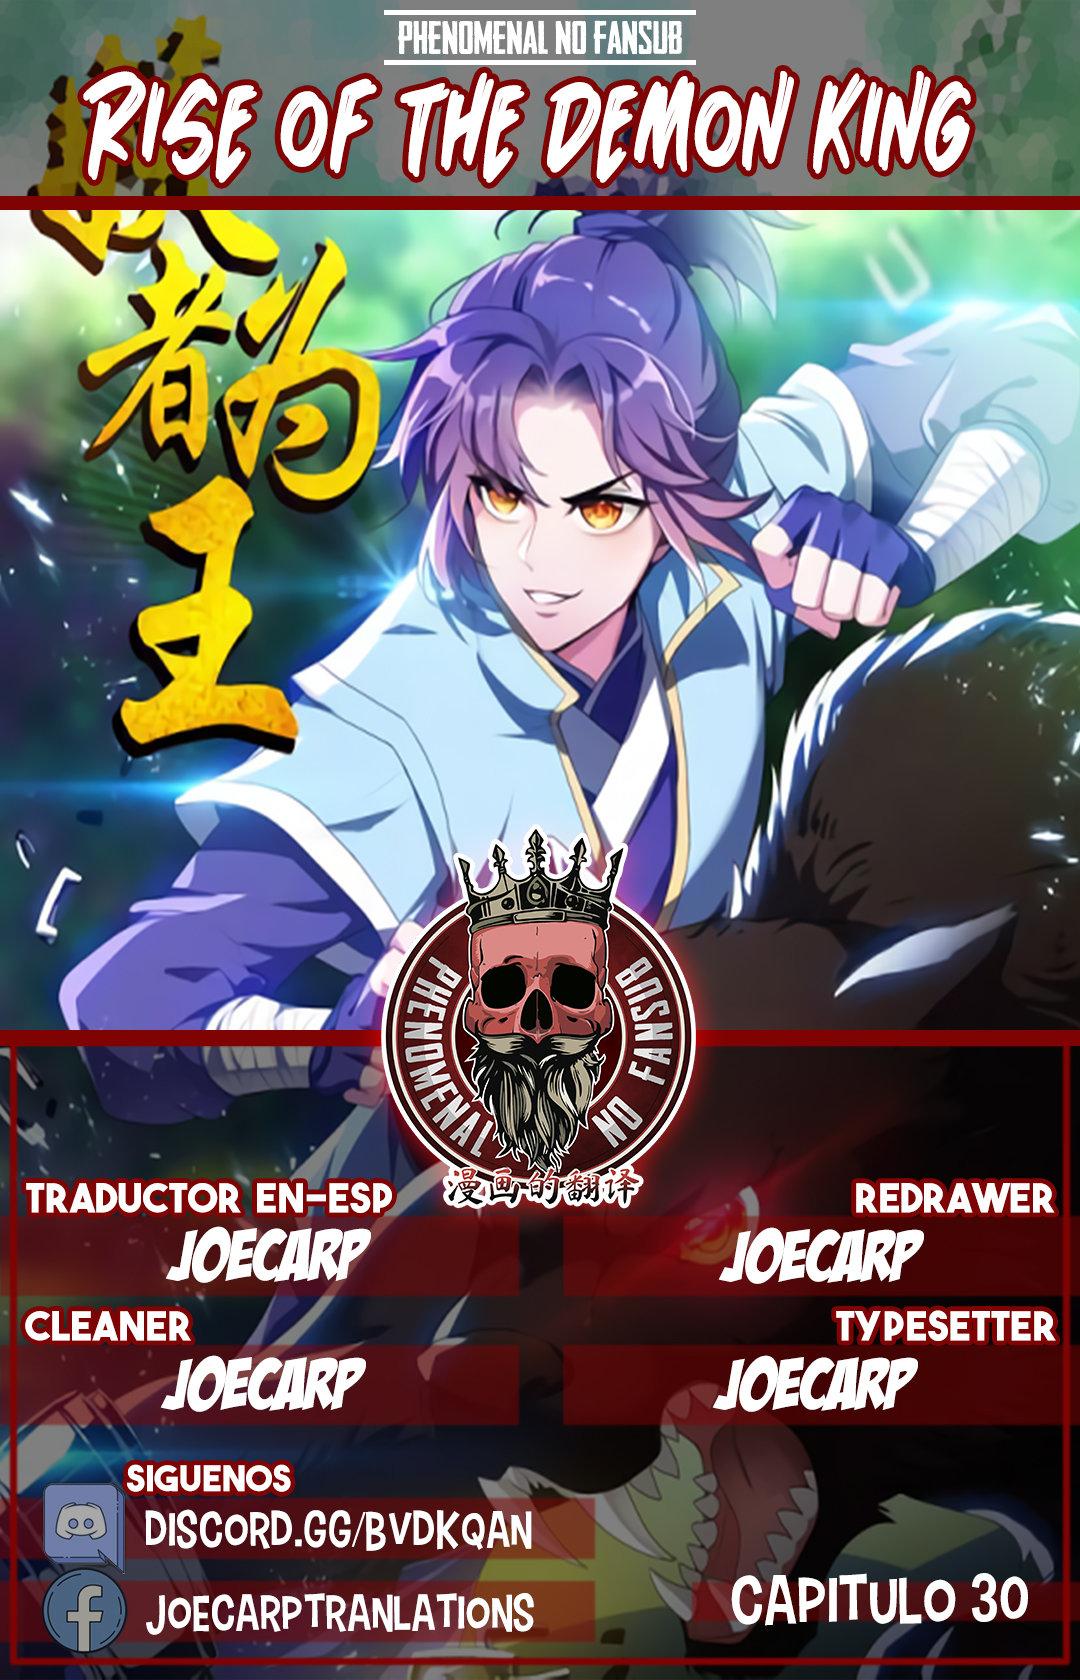 https://nine.mangadogs.com/es_manga/pic8/33/28385/946727/125d09883eb10b2d02e609a058f5621d.jpg Page 1